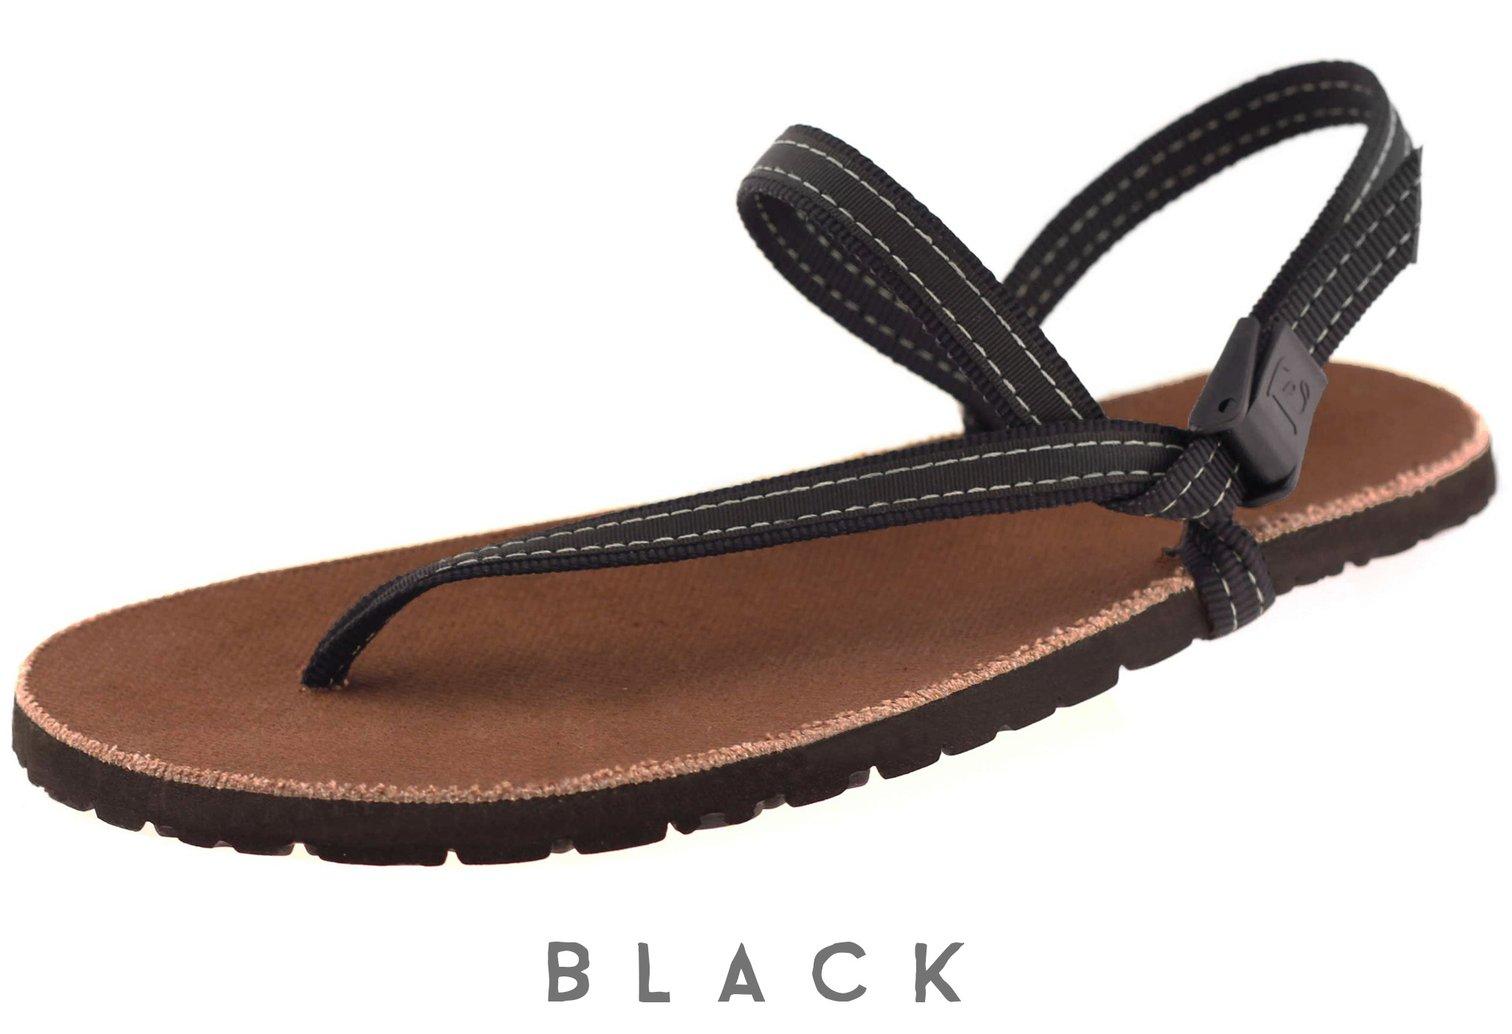 Alpha Lifestyle Sandals Picture 2